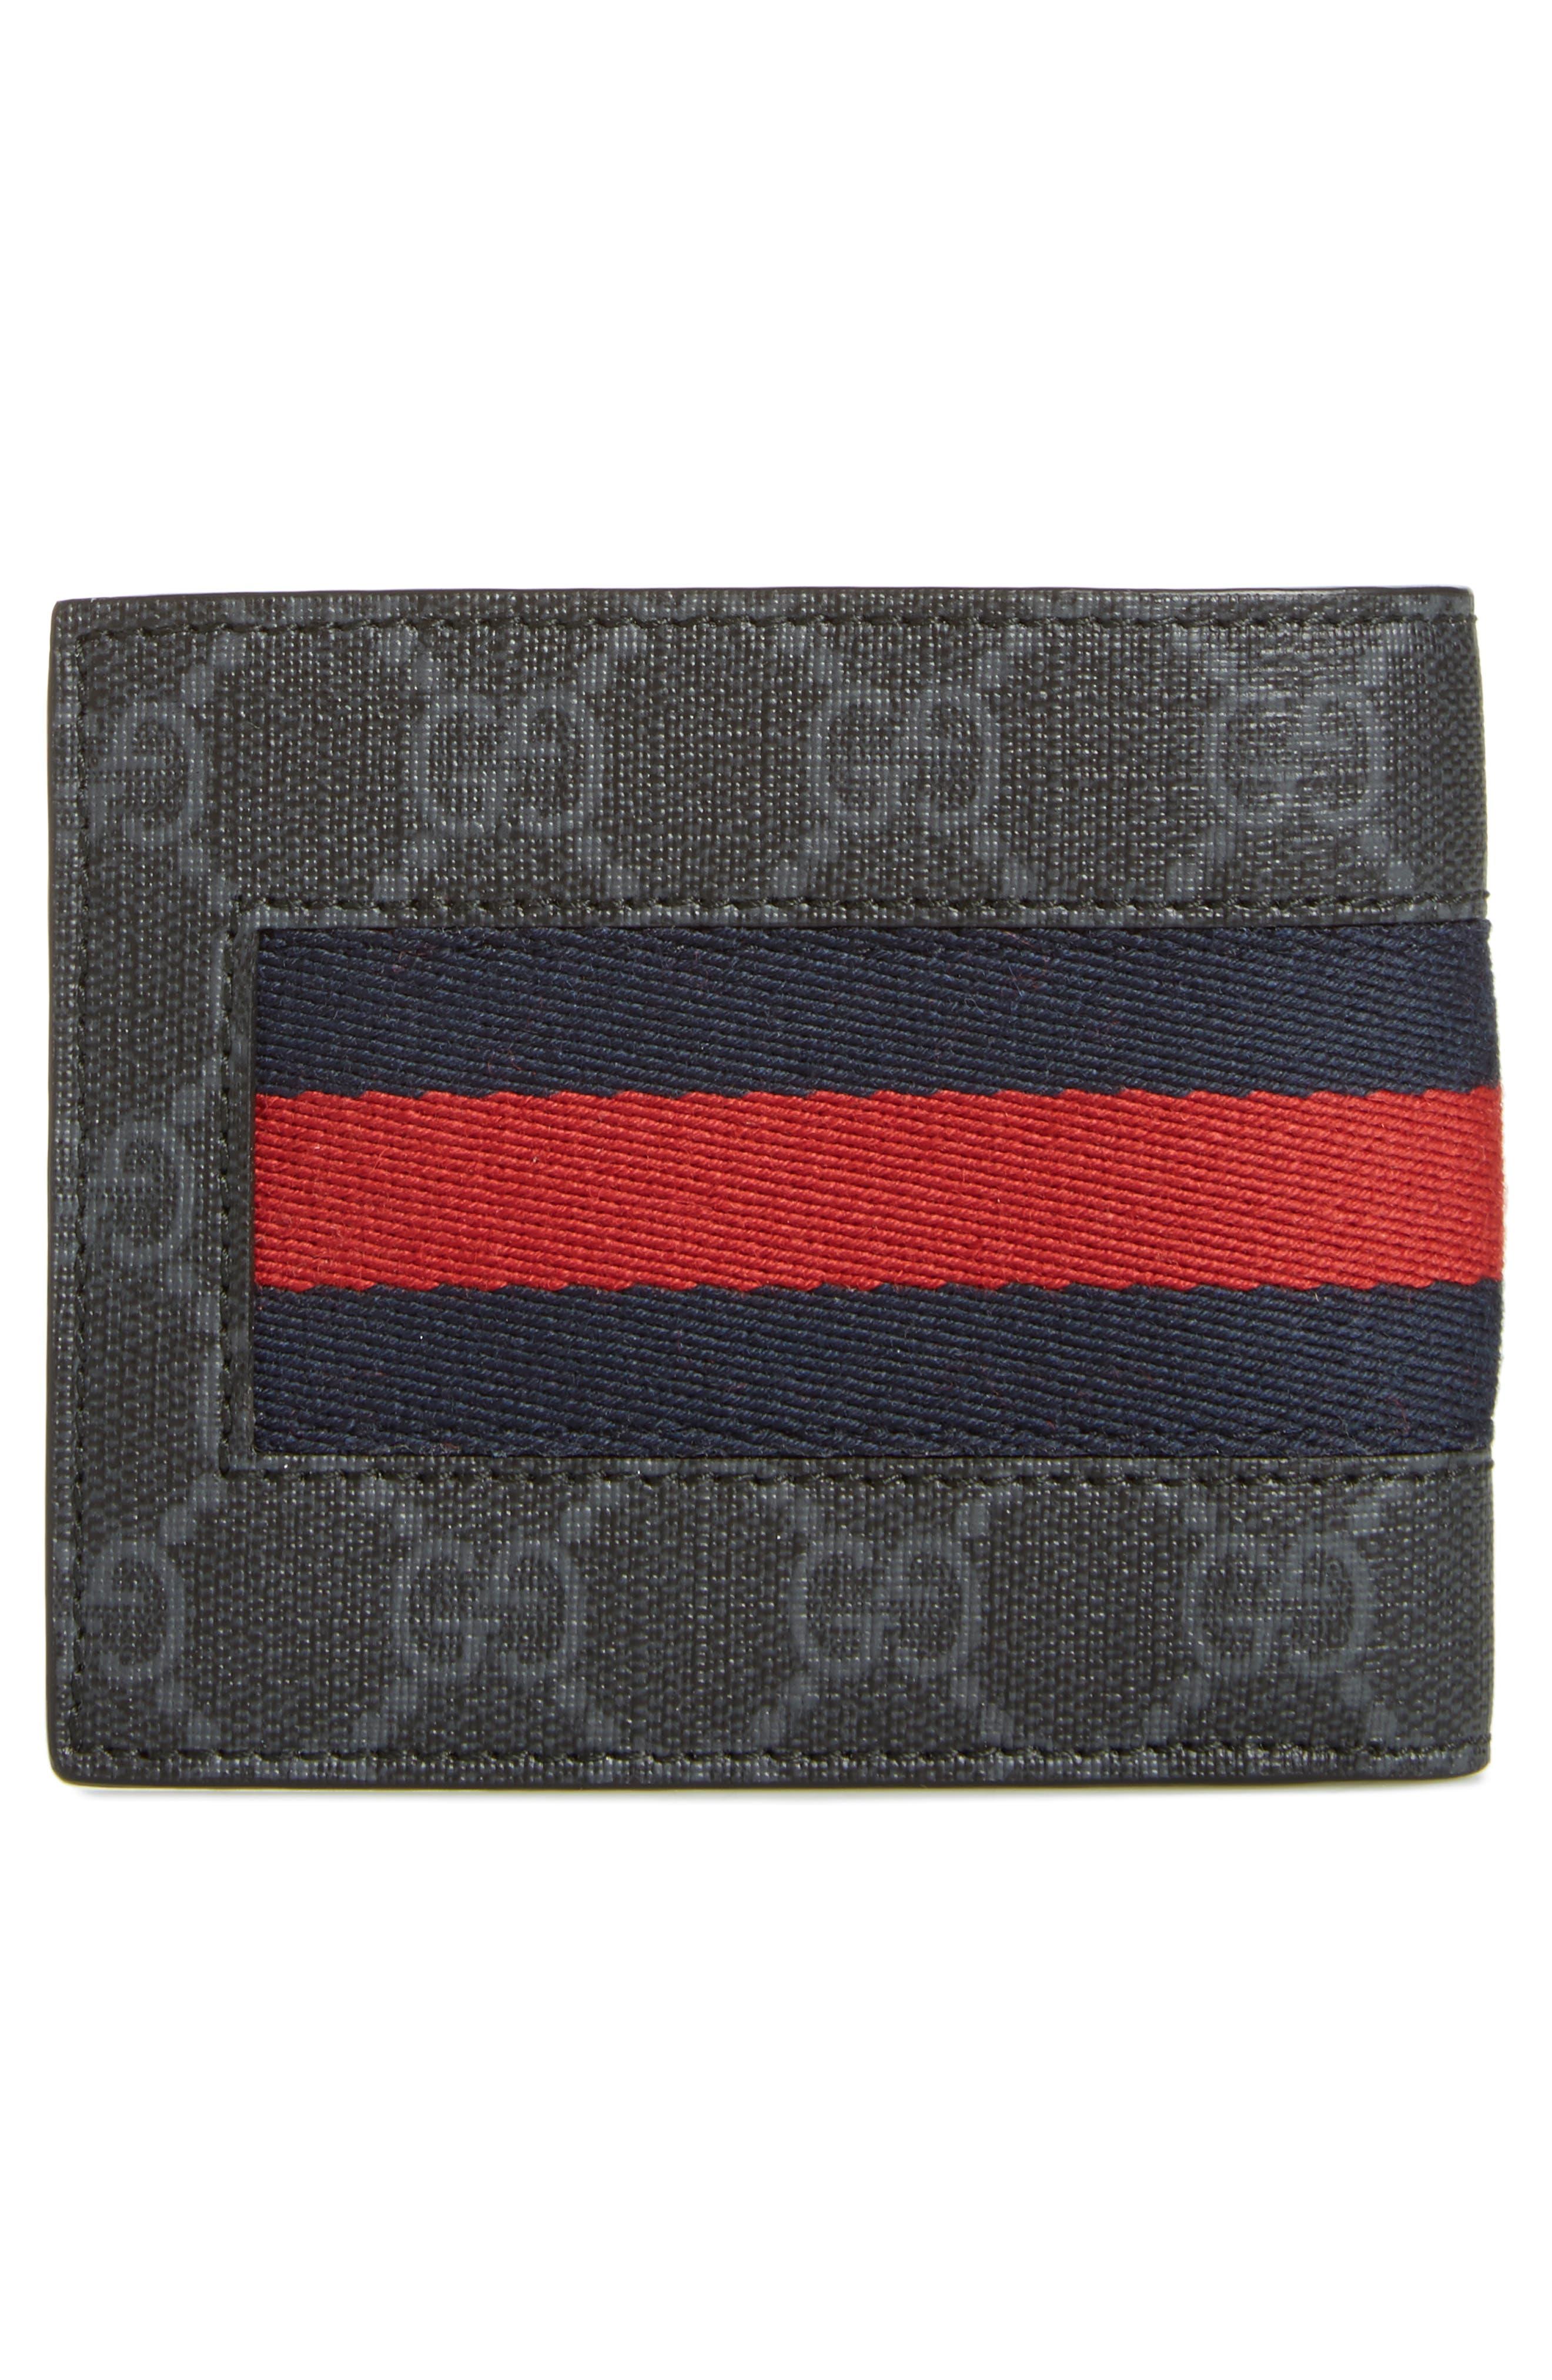 Alternate Image 3  - Gucci Supreme Wallet